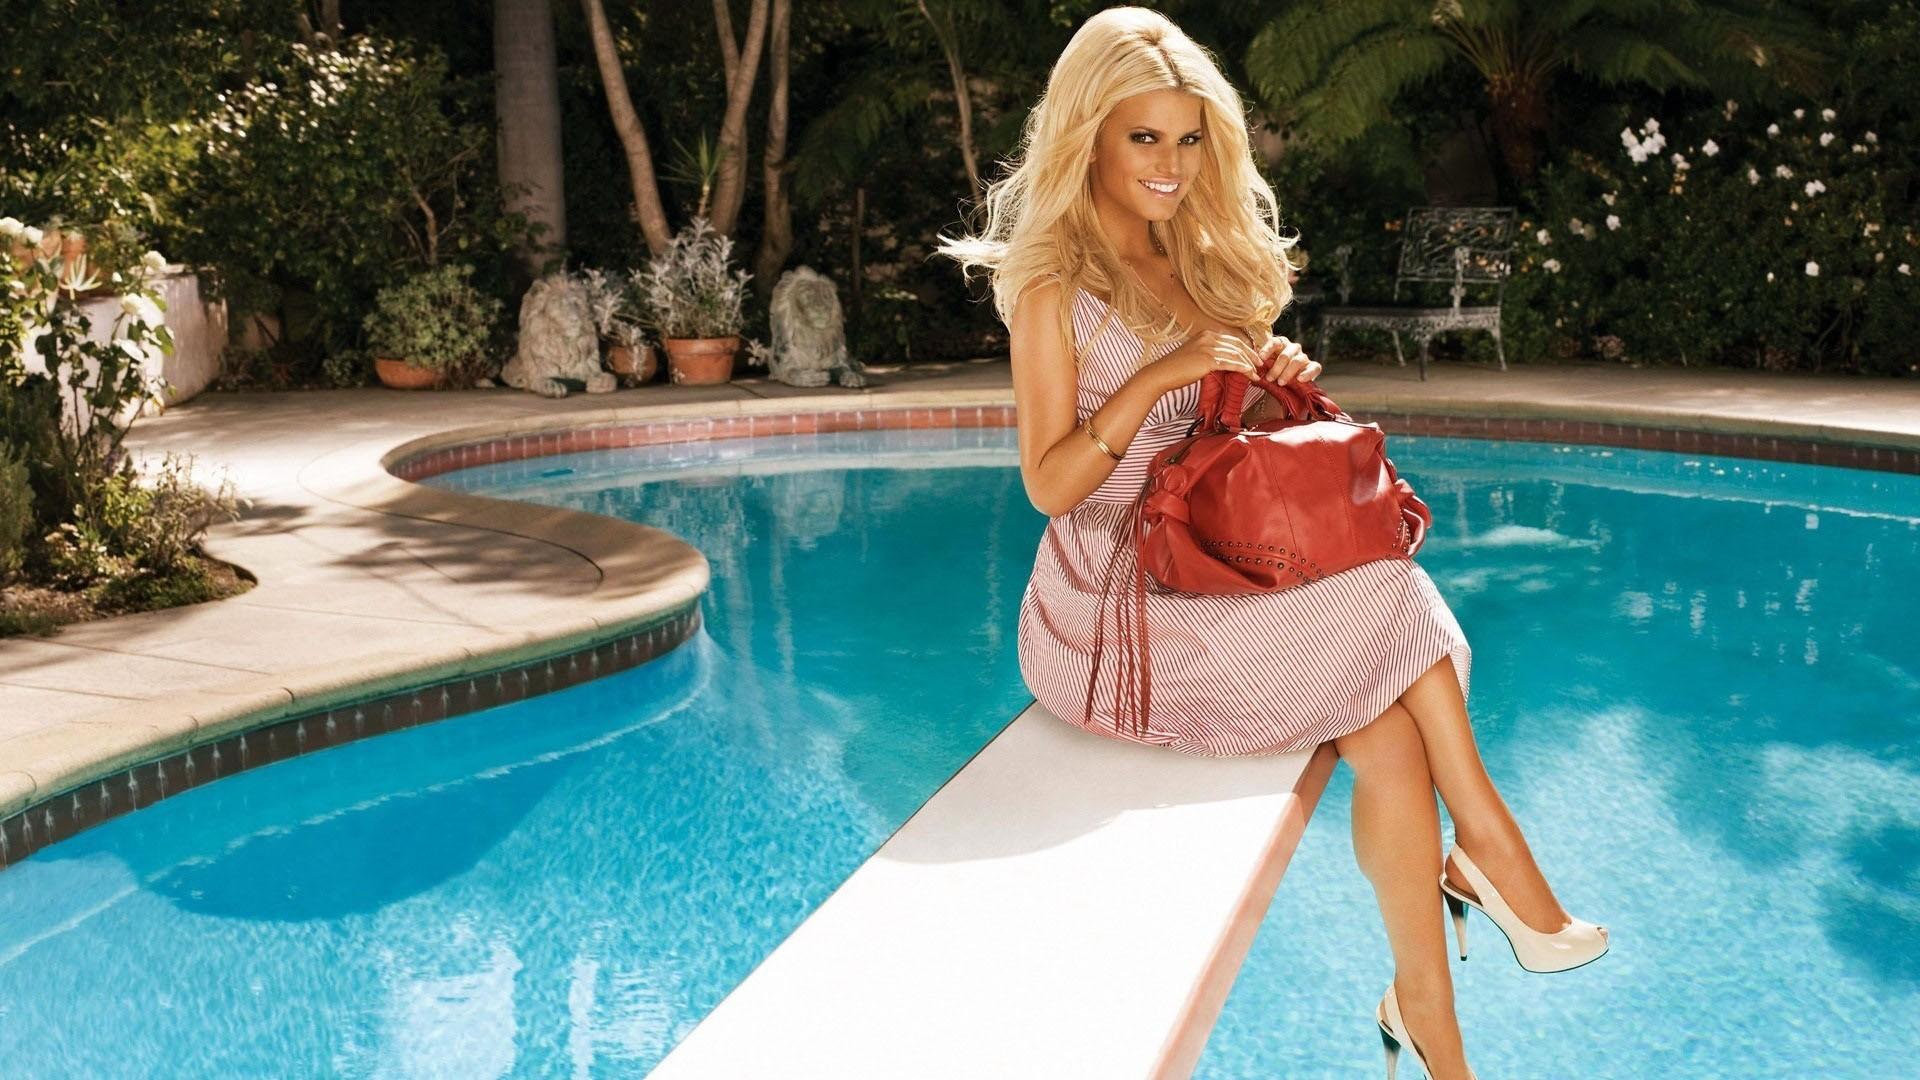 Wallpaper Jessica simpson, Blonde, Pool, Handbag, Dress